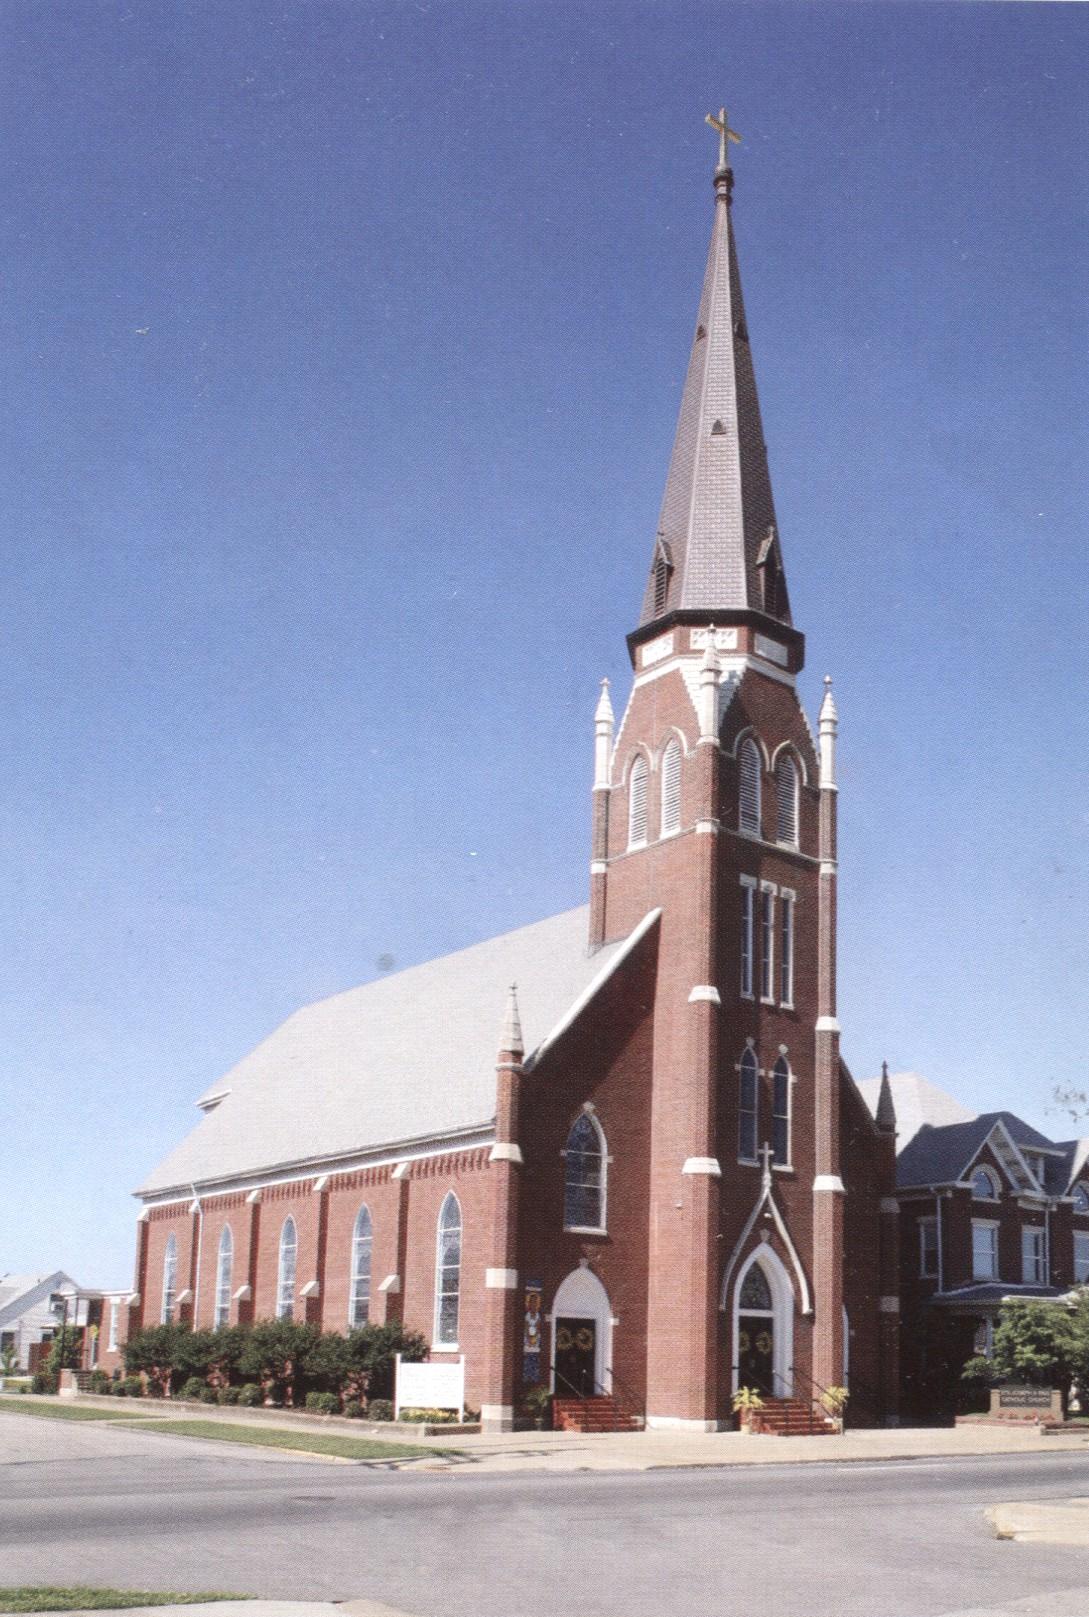 Sts. Joseph & Paul Church, formerly St. Paul Church, 2012